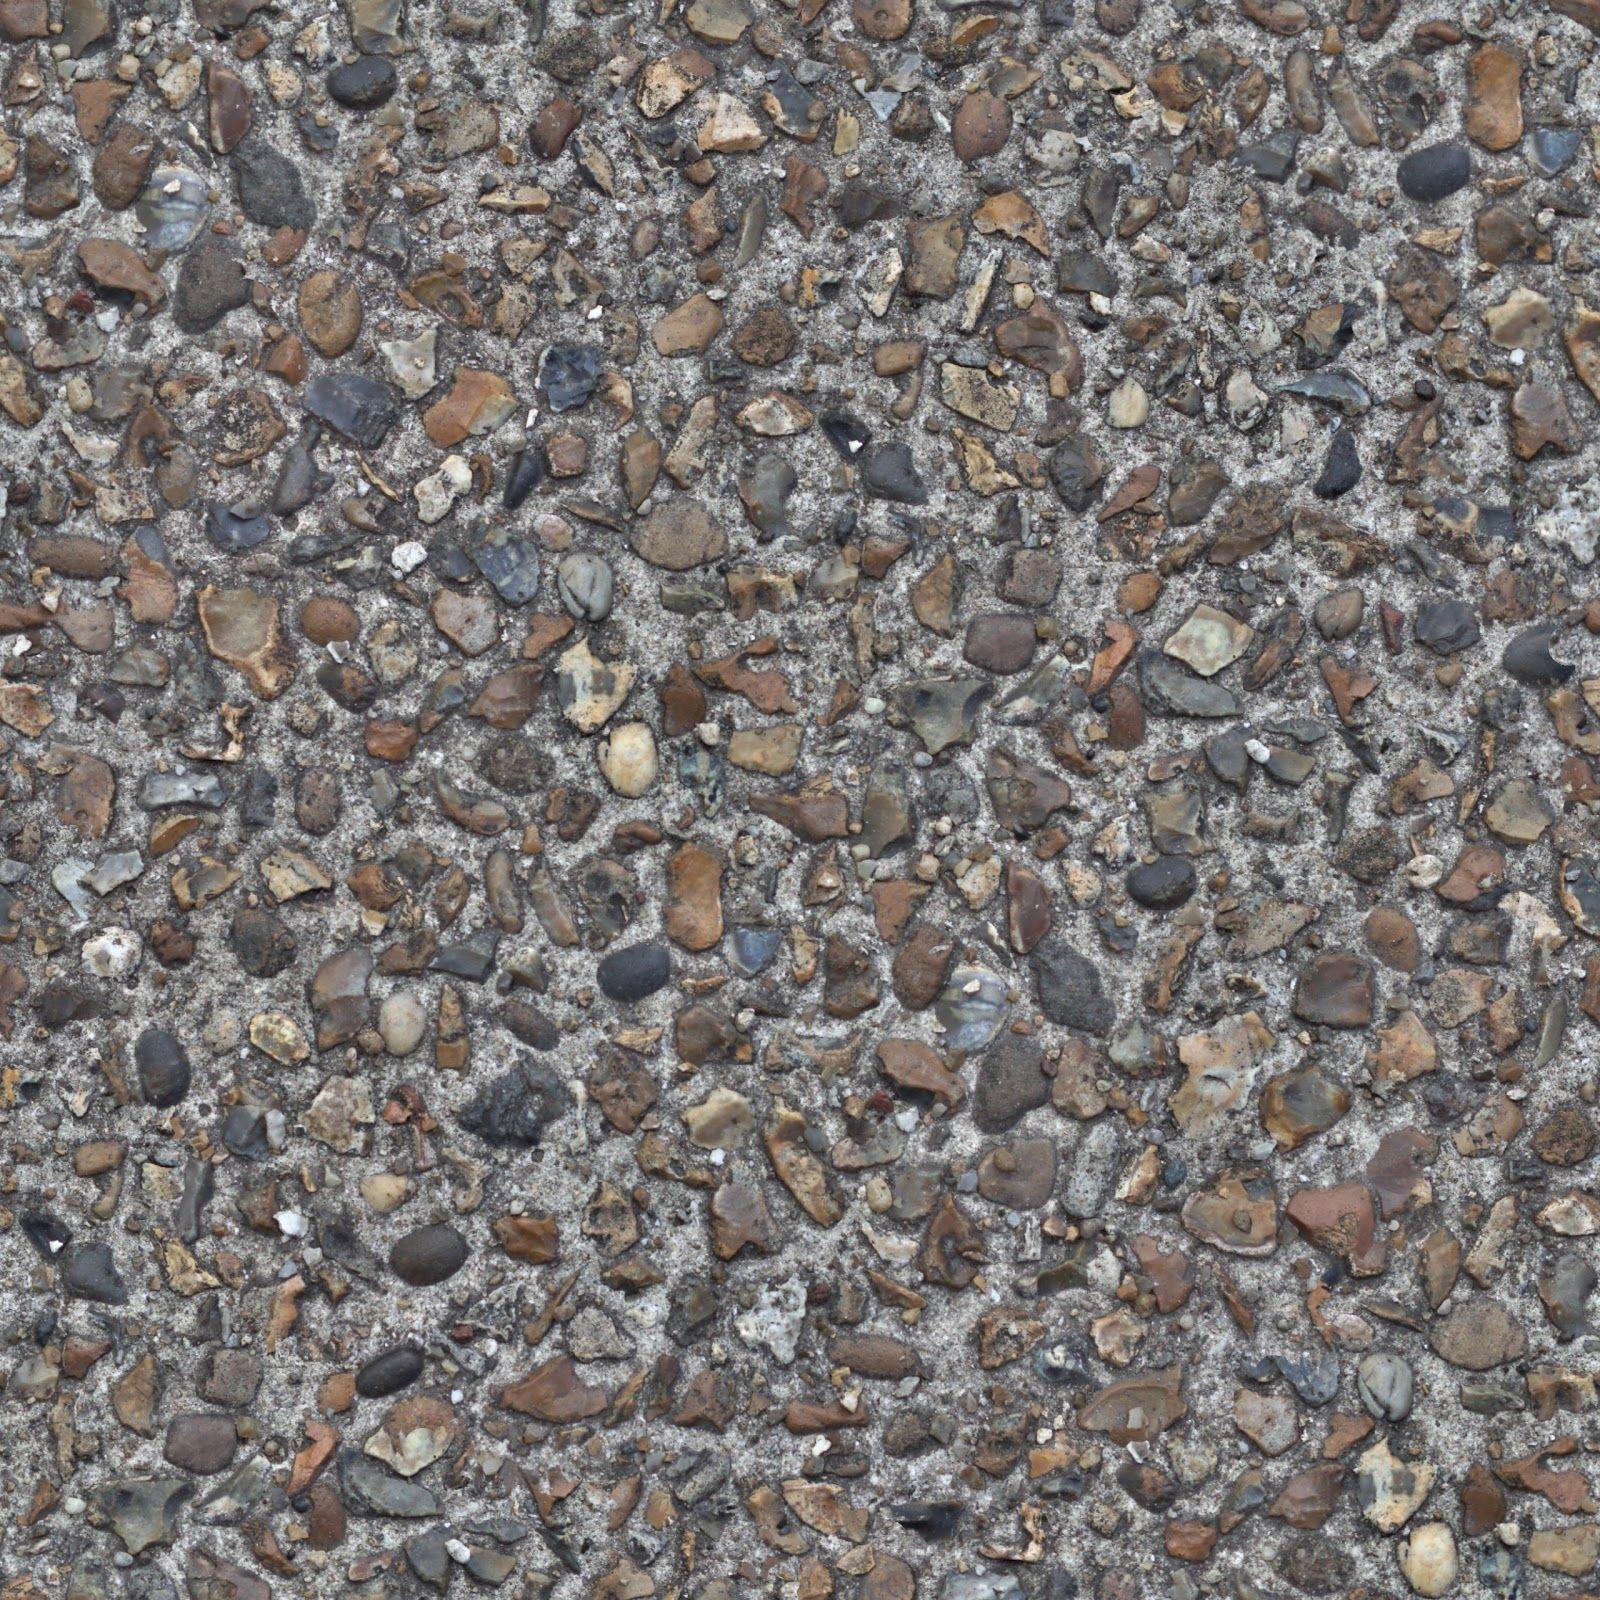 Textures architecture roads roads dirt road texture seamless - Seamless Concrete Cobble Pebble Stone Texture 2048x2048